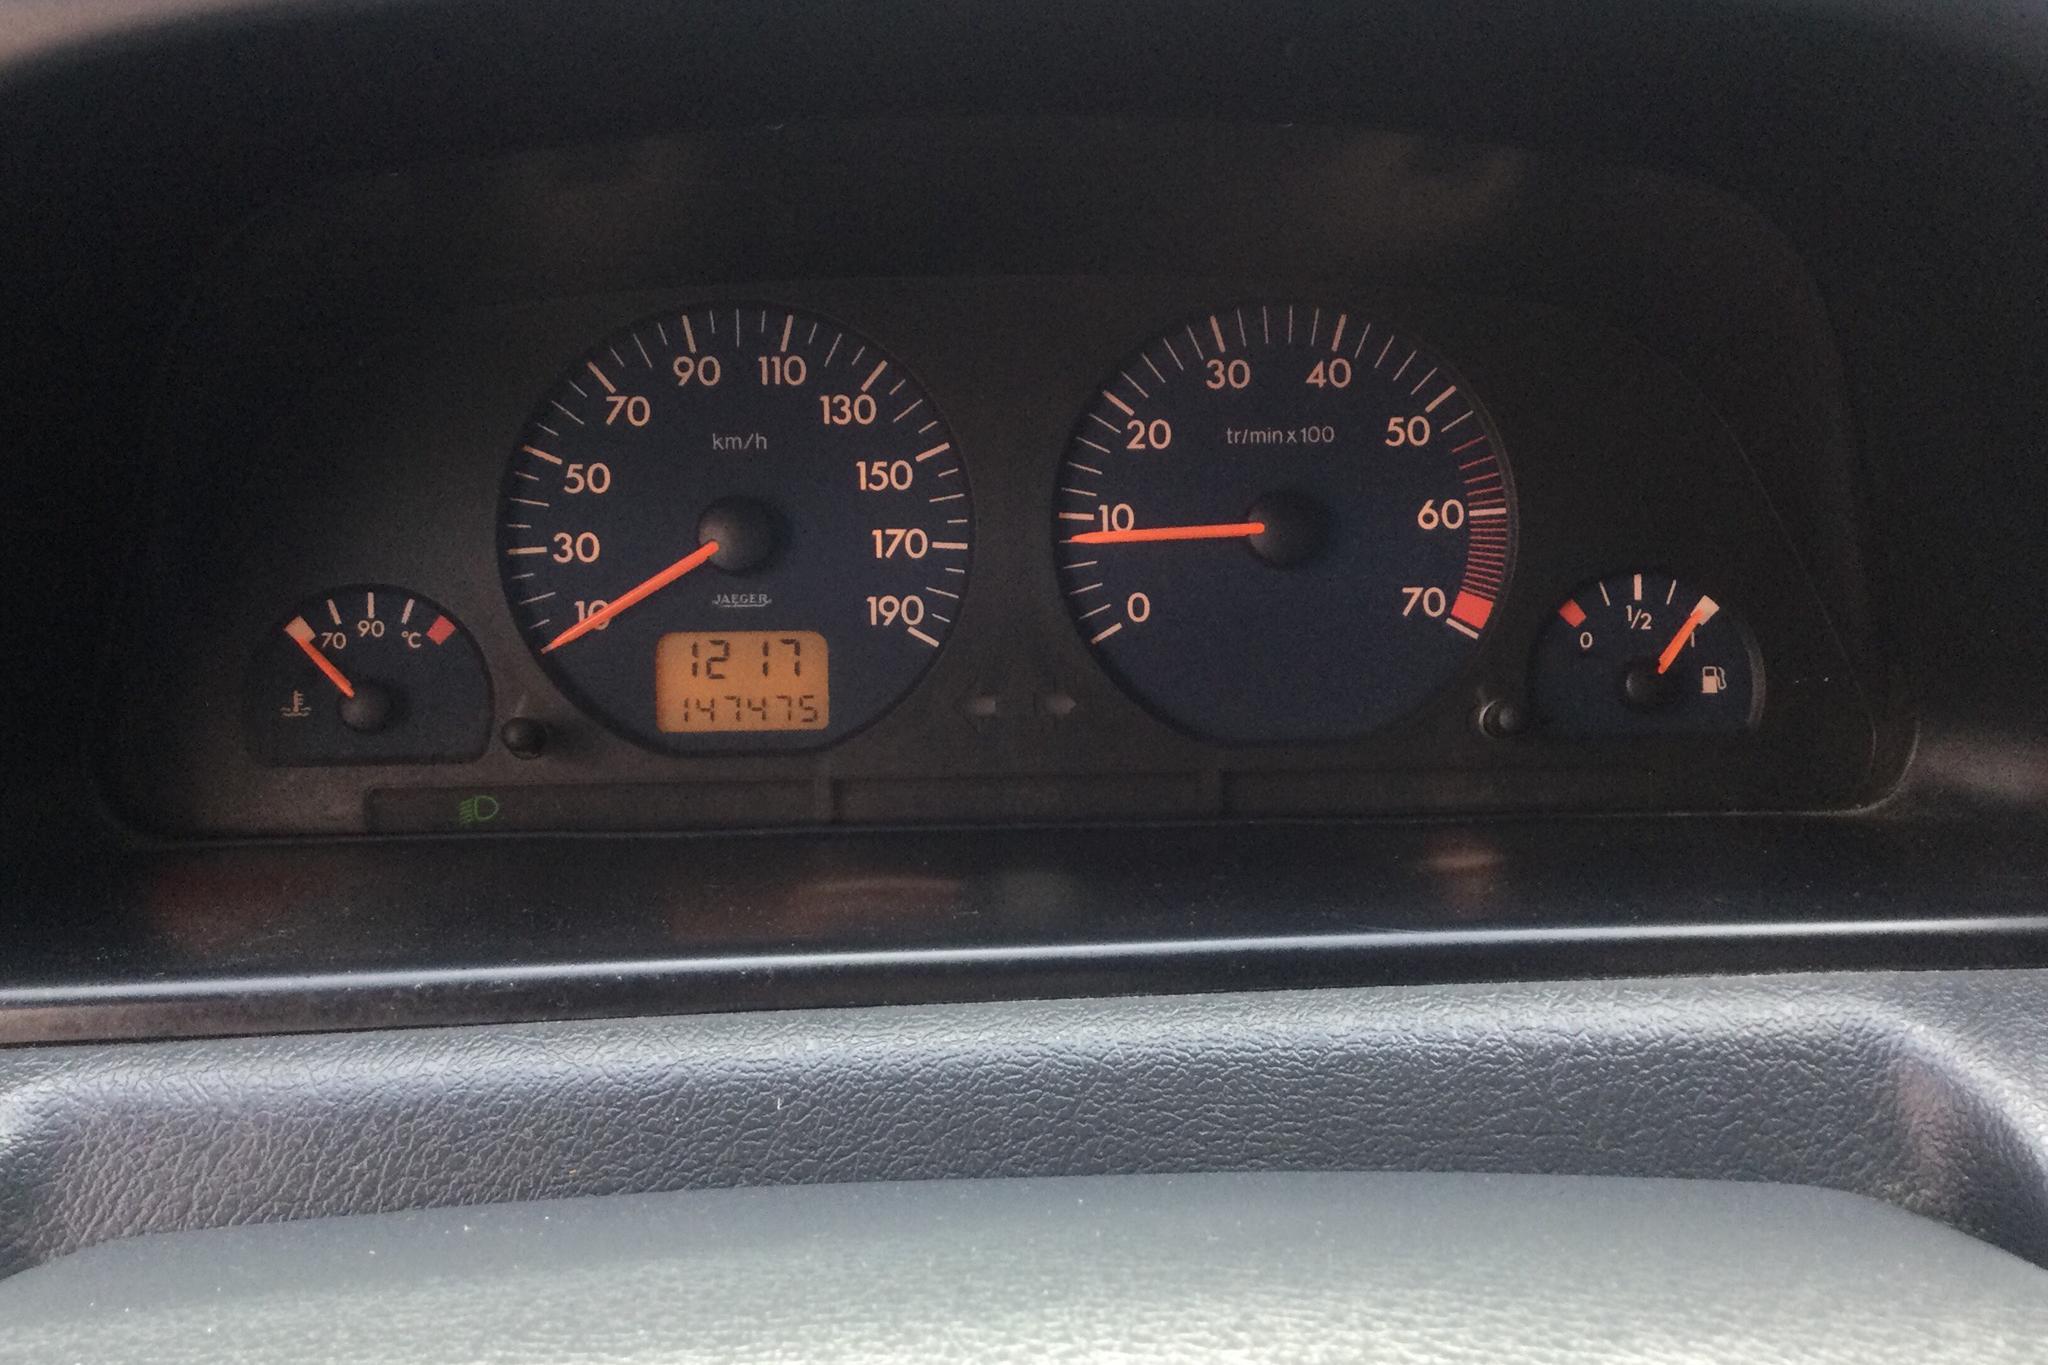 Fiat Scudo 2.0 JTD Skåp (109hk) - 14 747 mil - Manuell - vit - 2006